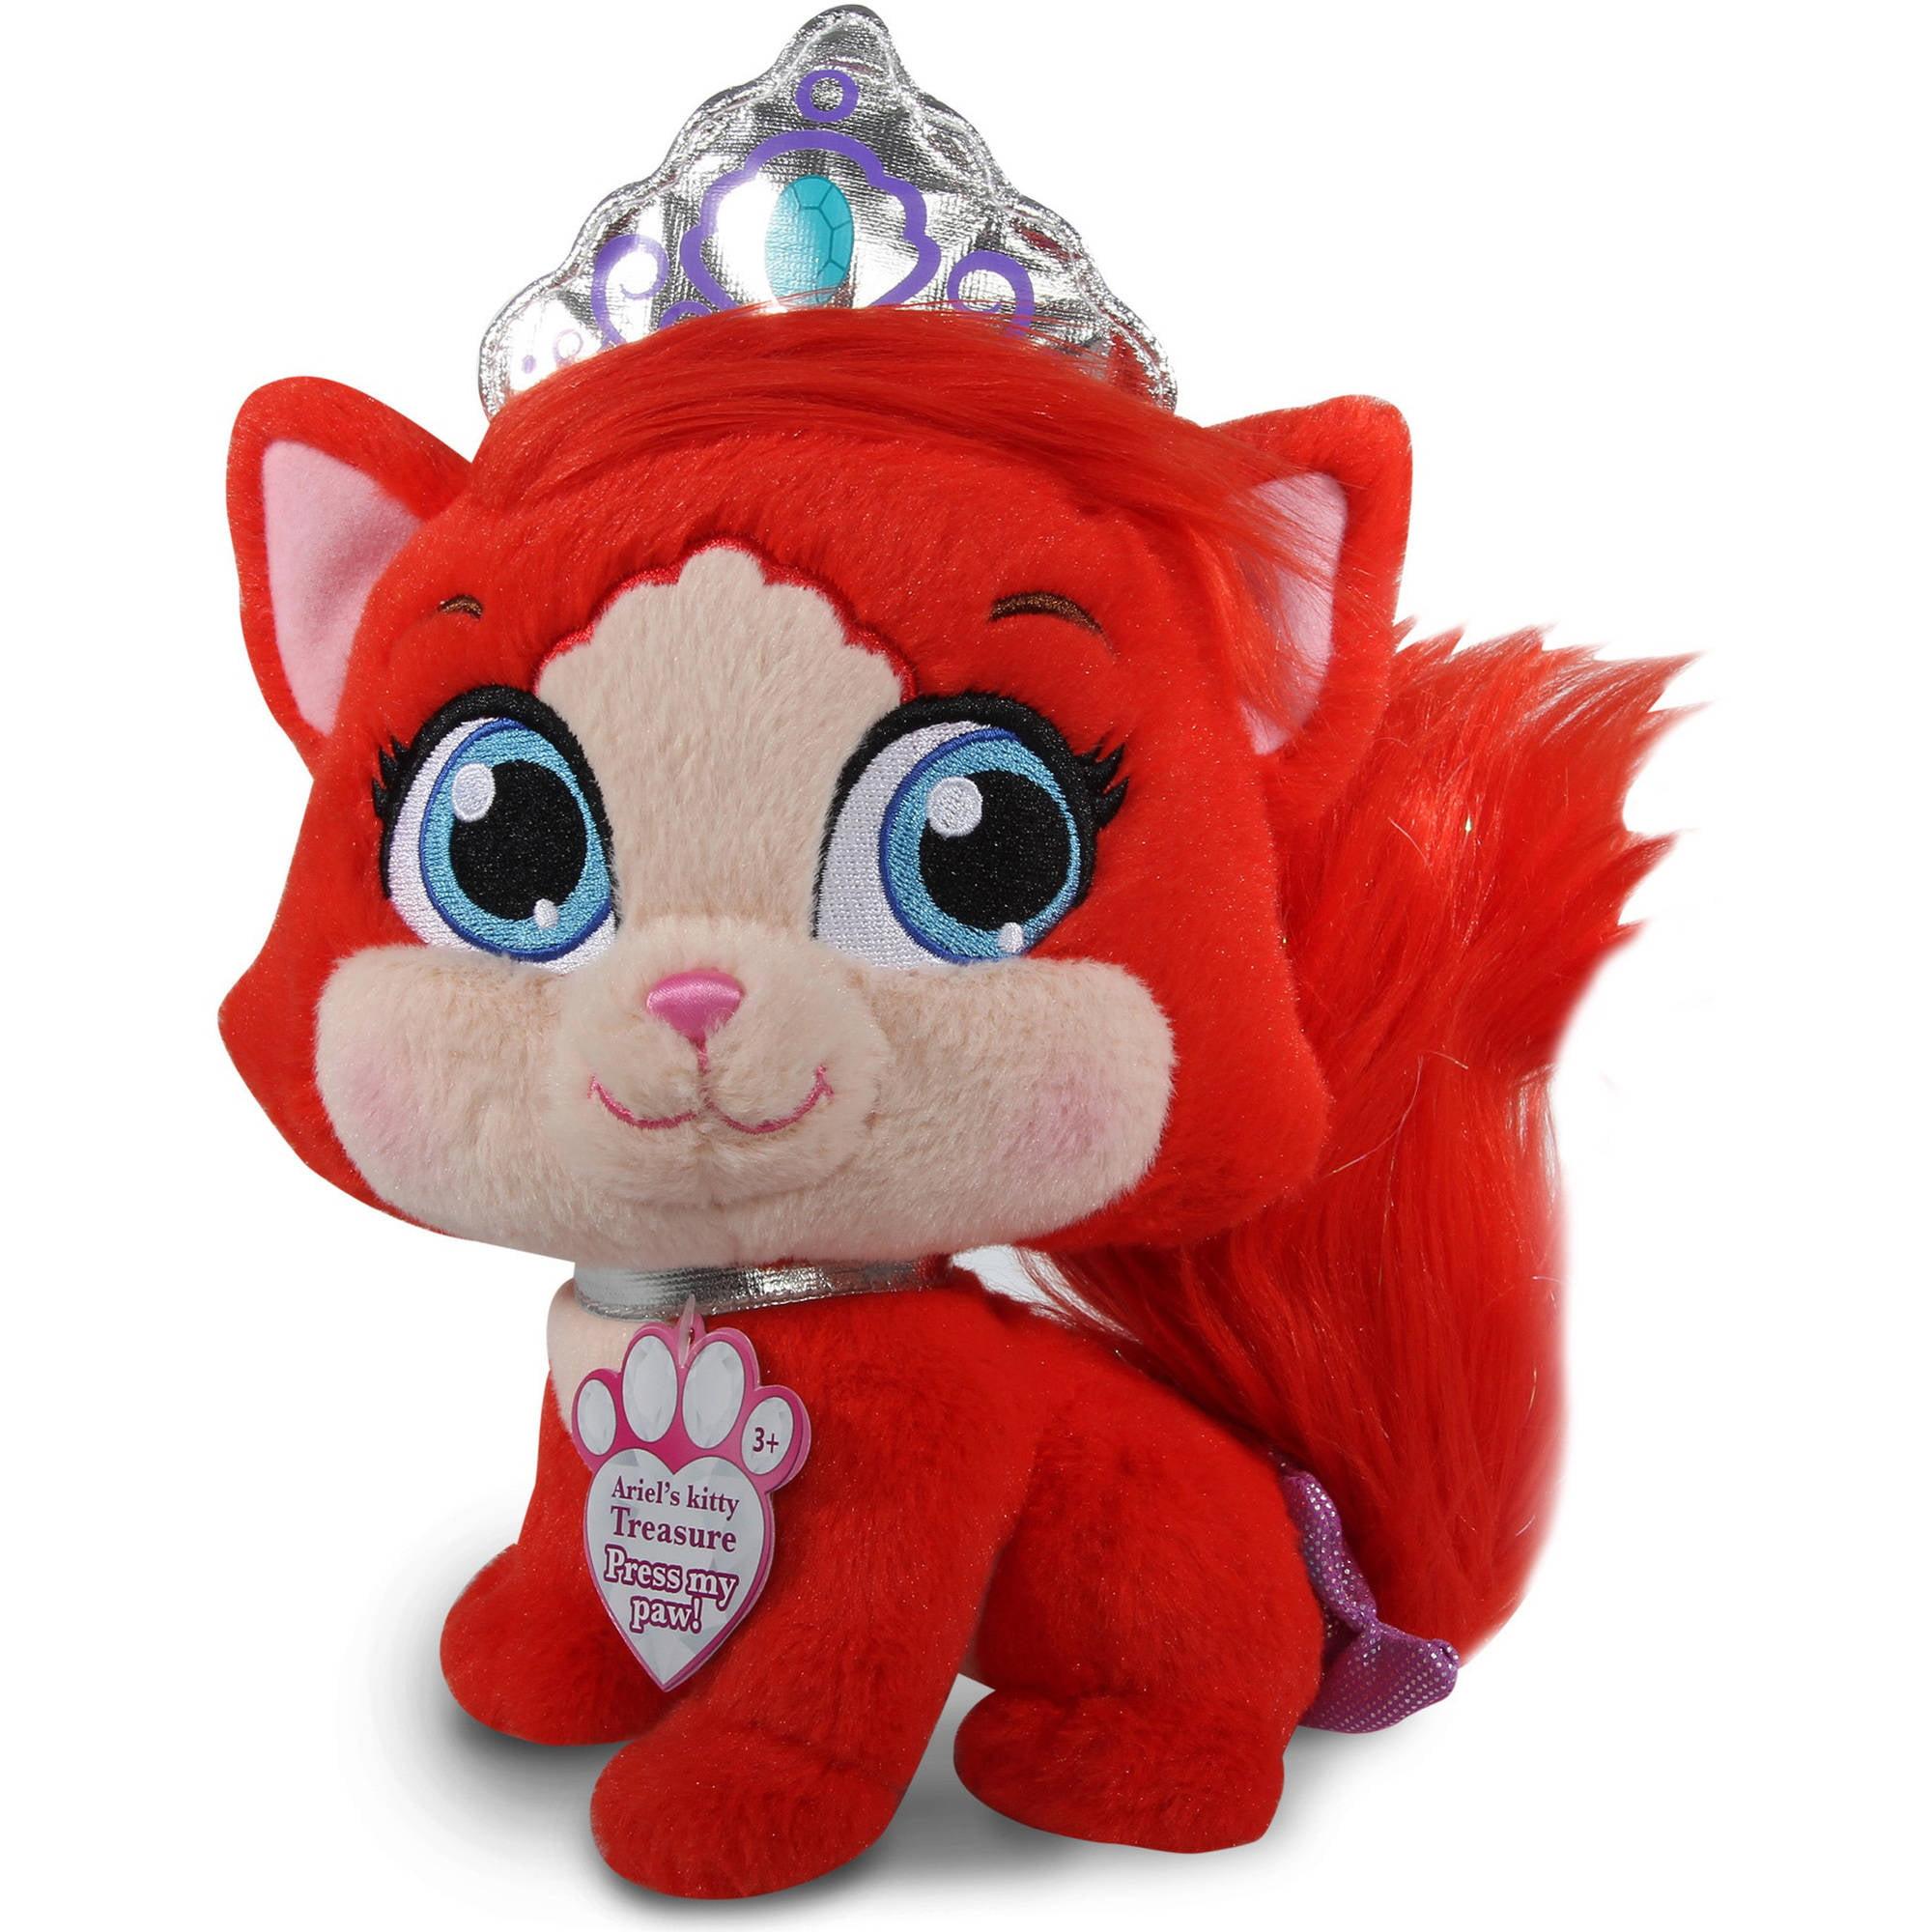 Disney Princess Palace Pets Ariel S Kitty Treasure Talking Singing Pet Tv Movie Character Toys